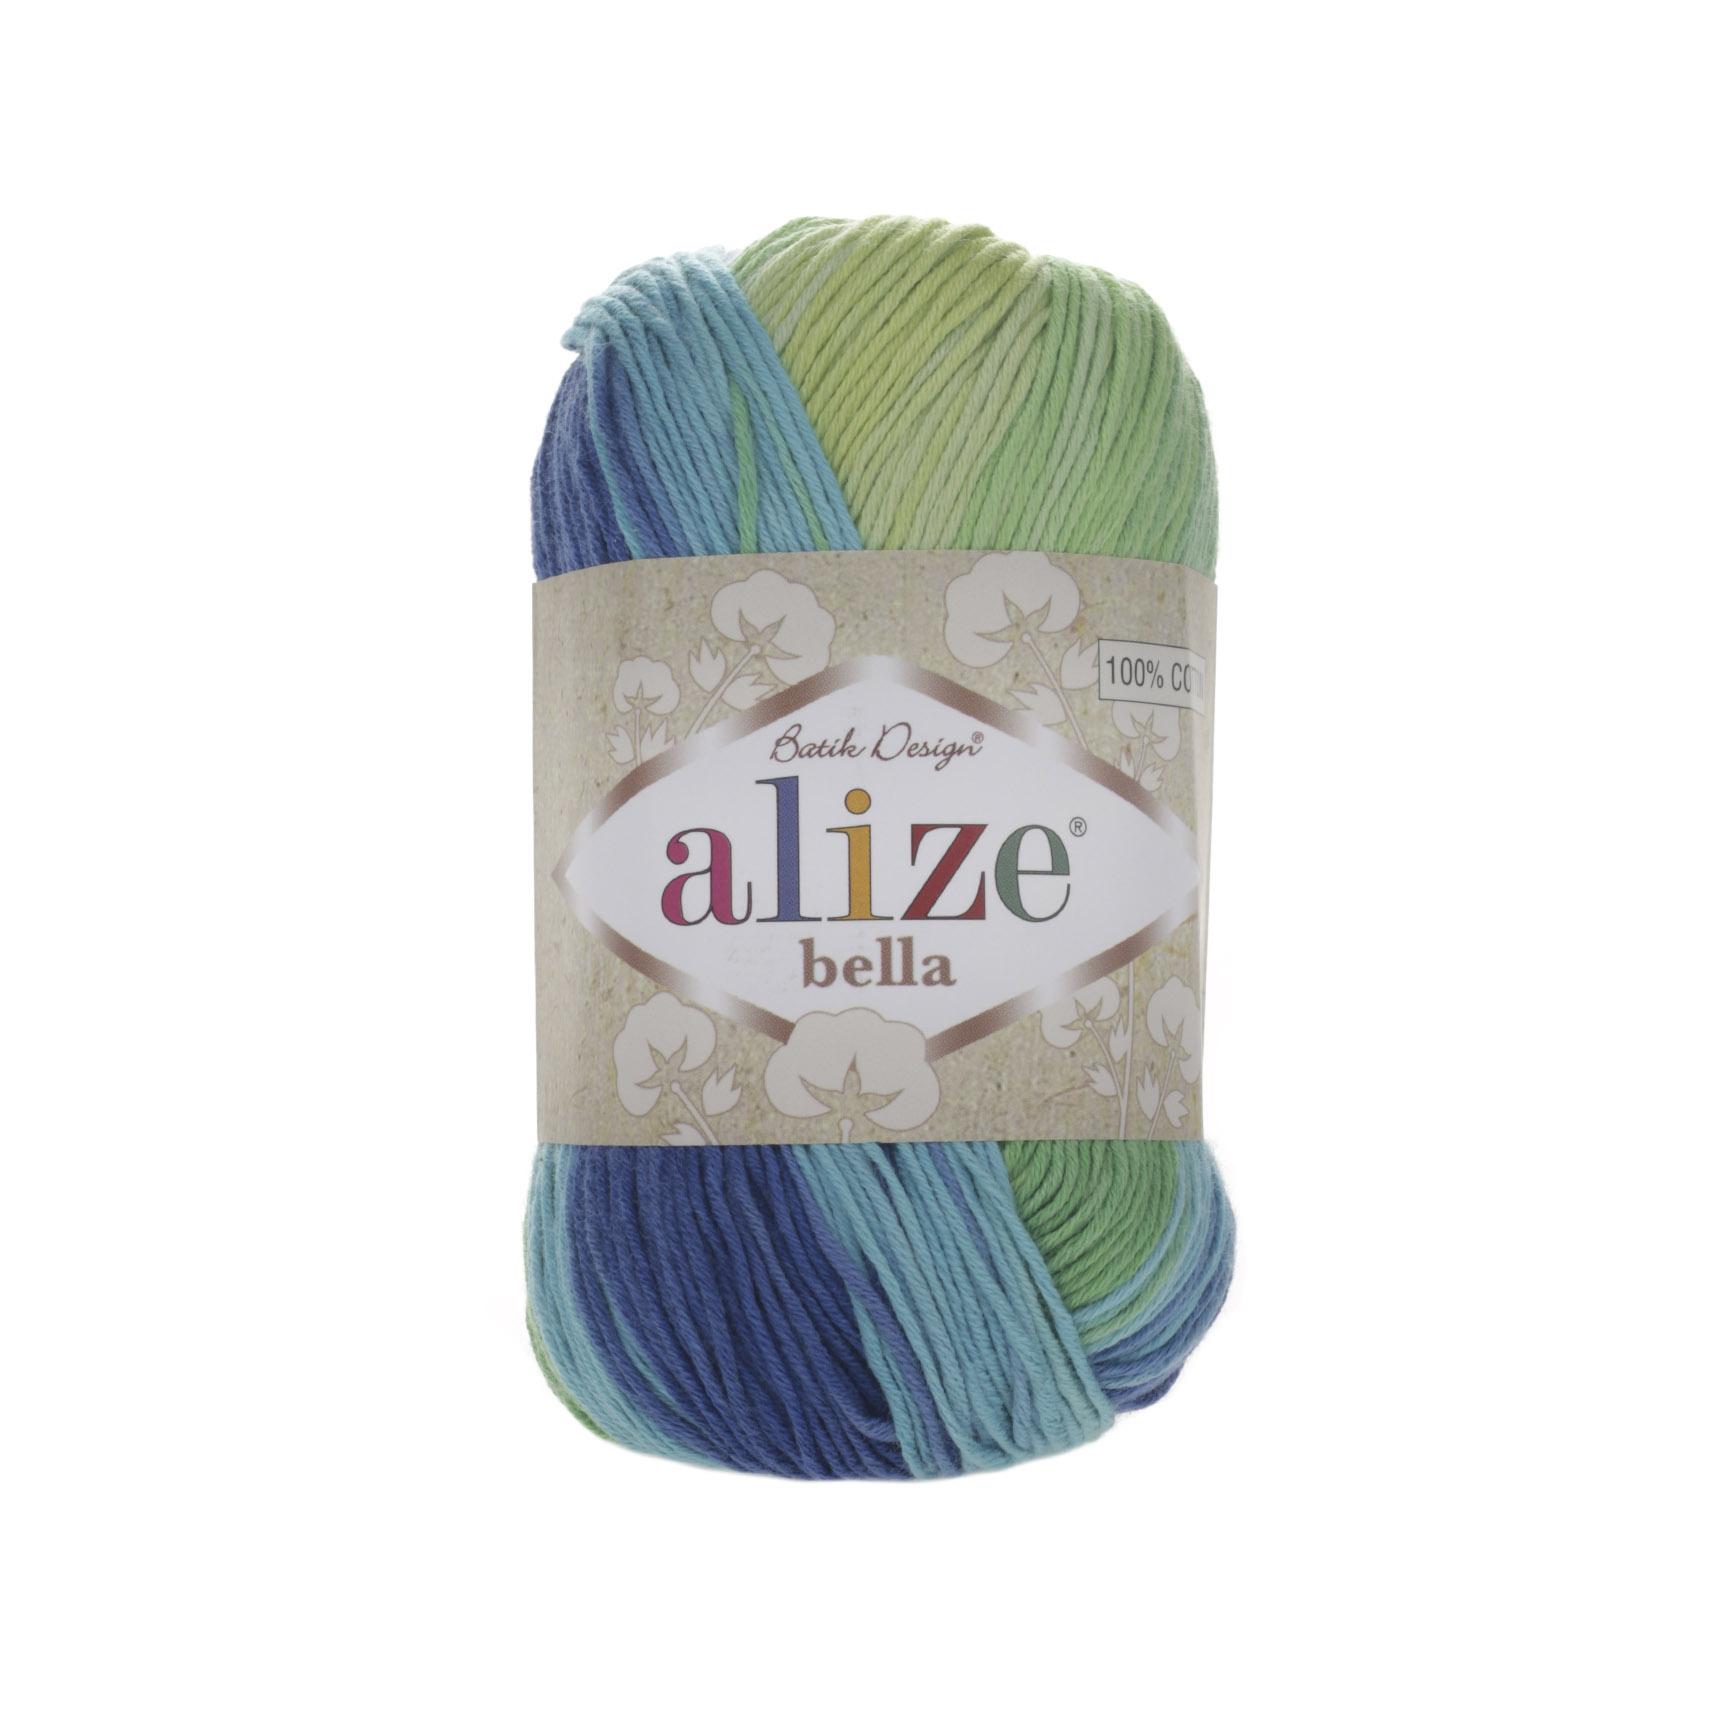 Alize Bella Batik Design Cod 4150-0